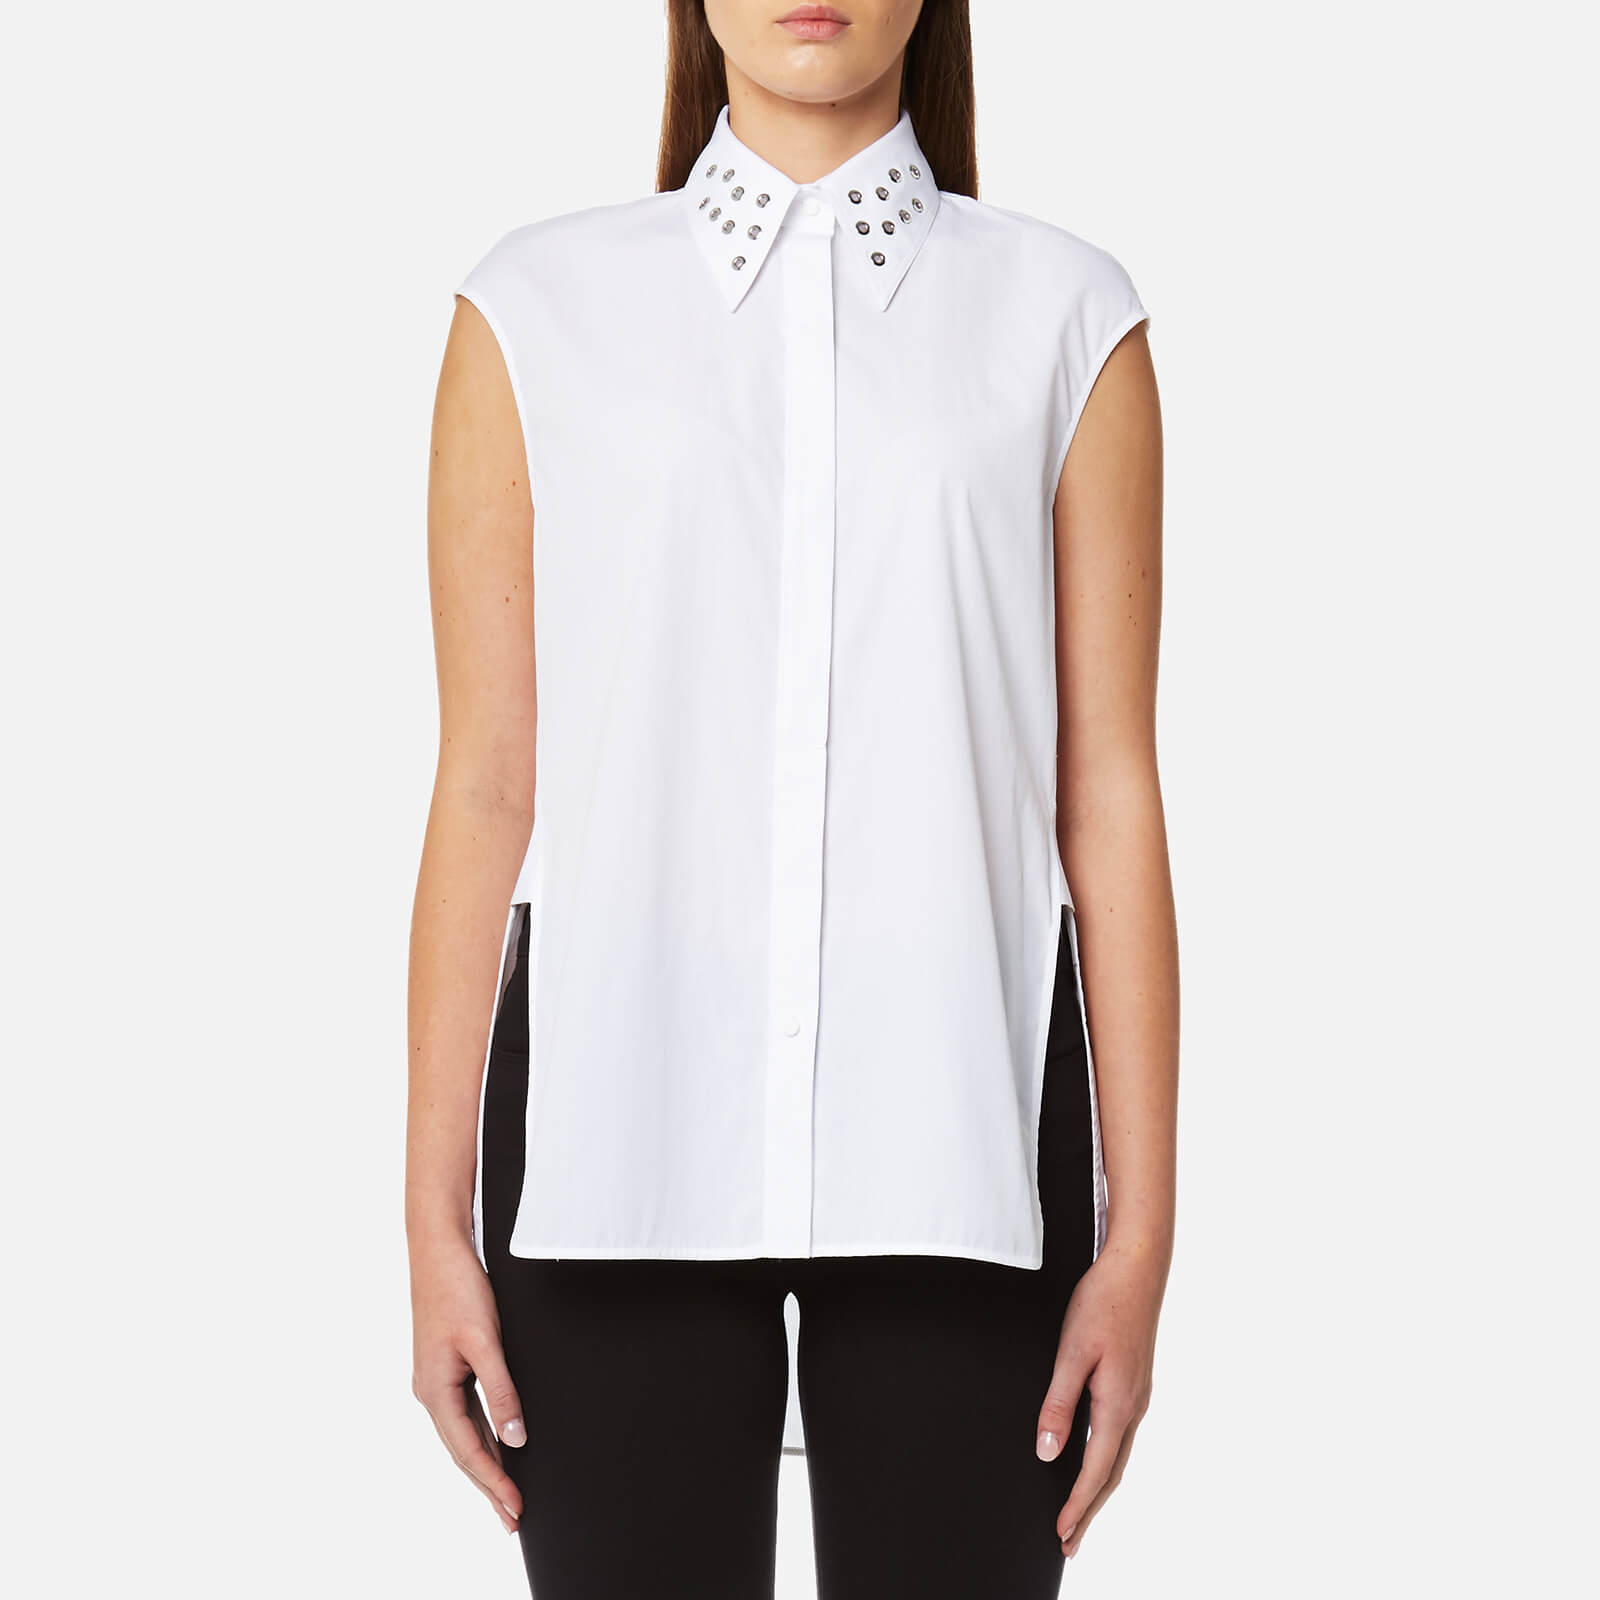 be0cab67 Helmut Lang Women's Eyelet Sleeveless Shirt - White - Free UK Delivery over  £50